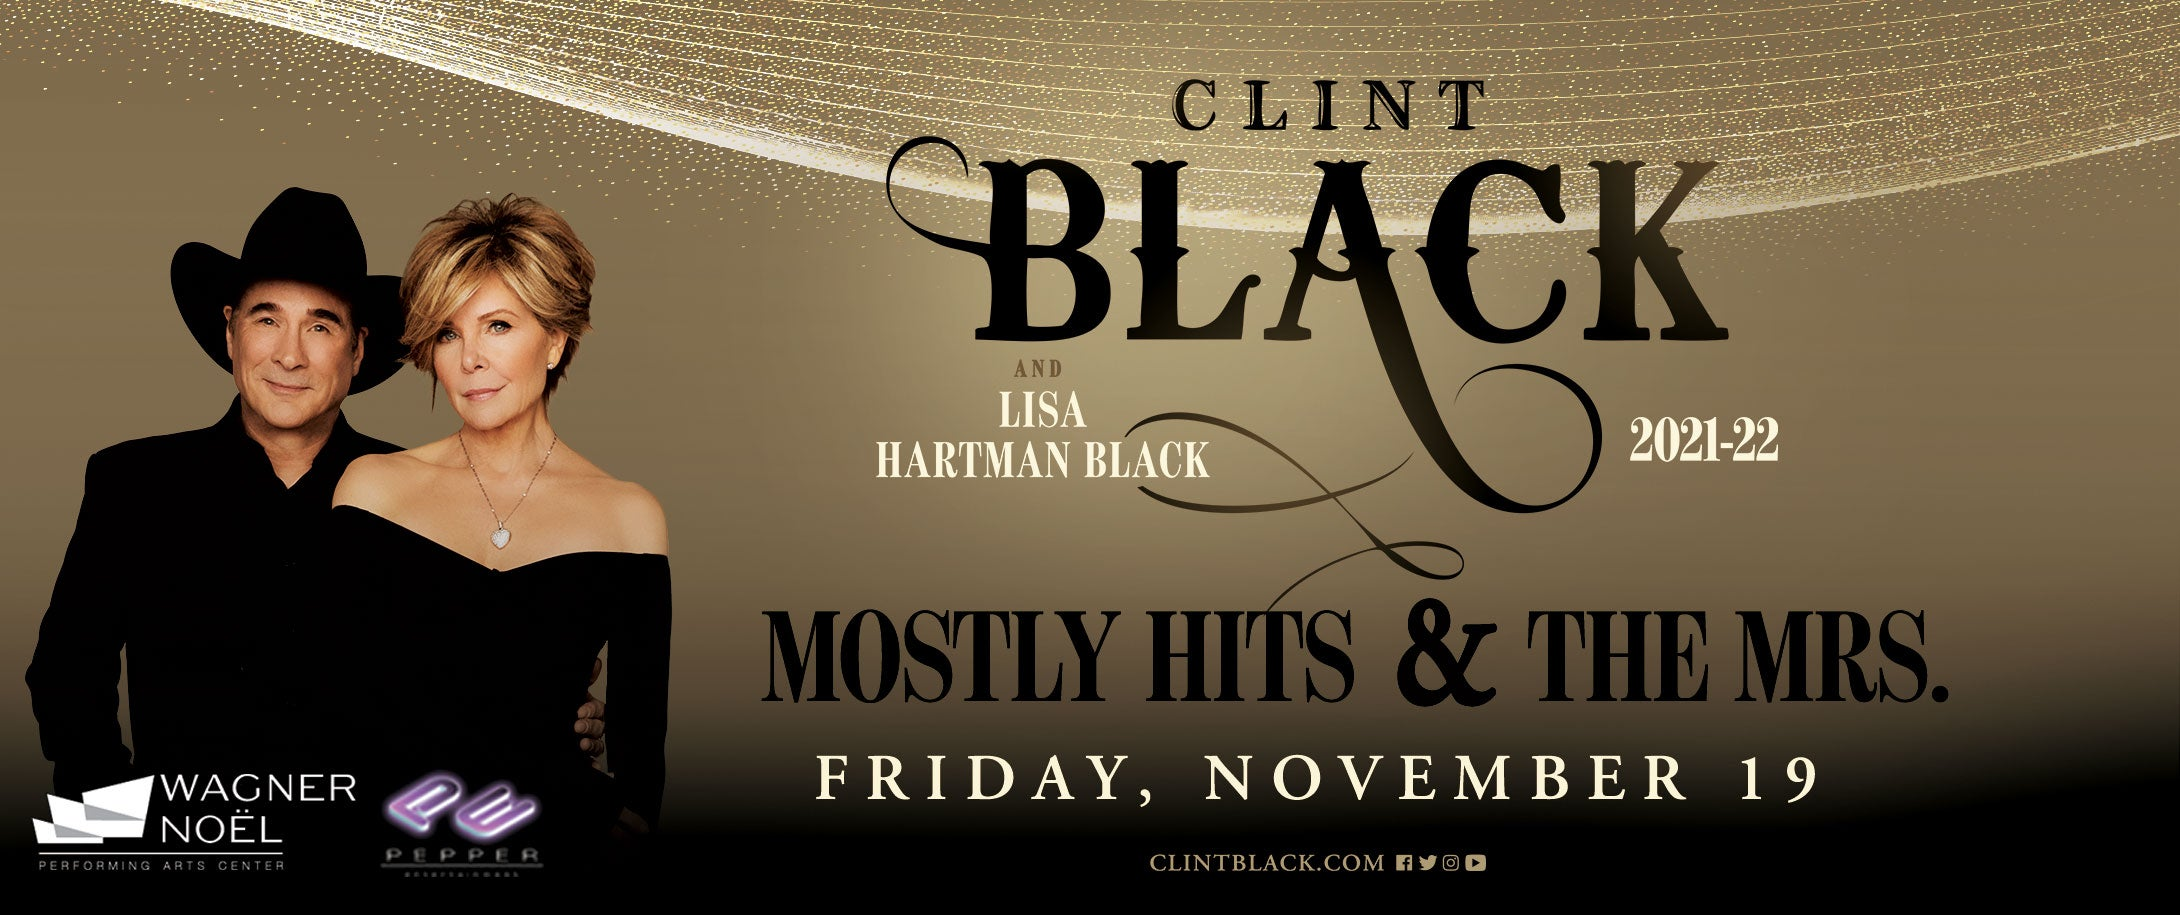 Clint Black Featuring Lisa Hartman Black